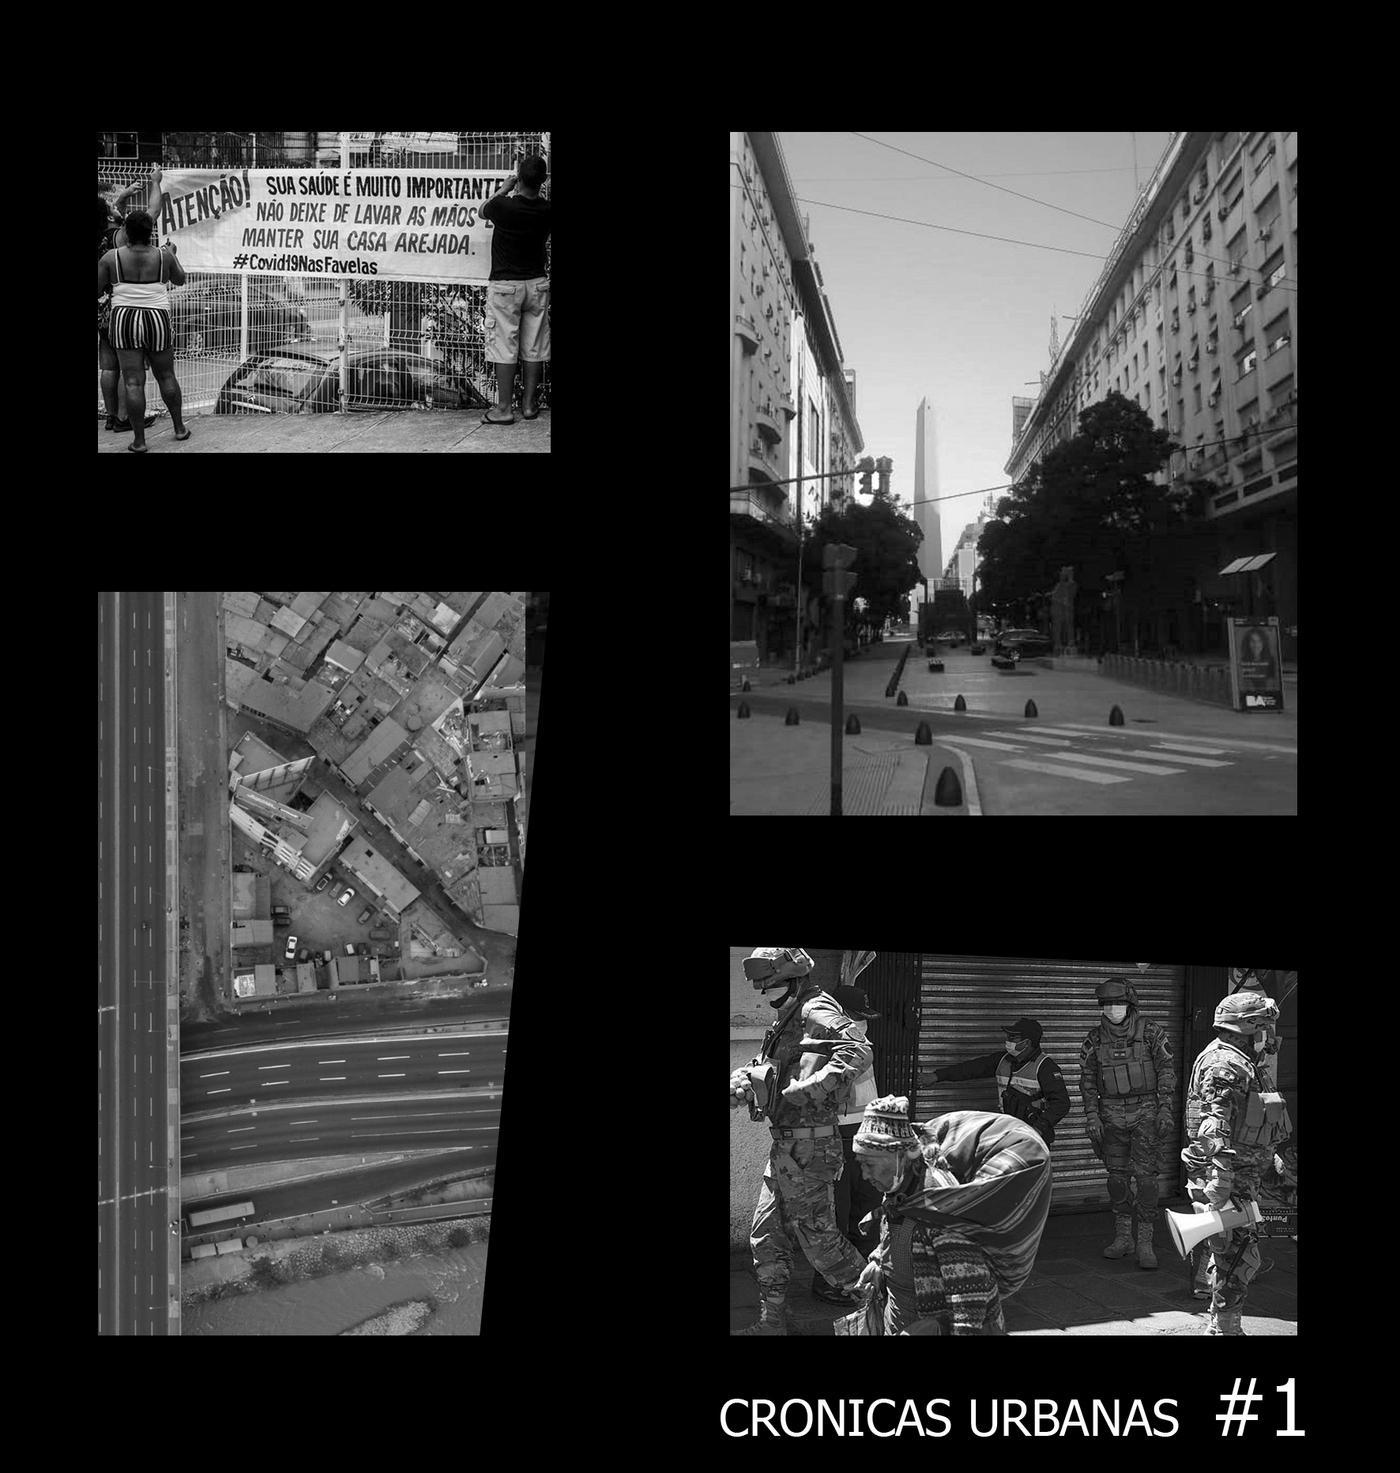 CRONICAS URBANAS #1